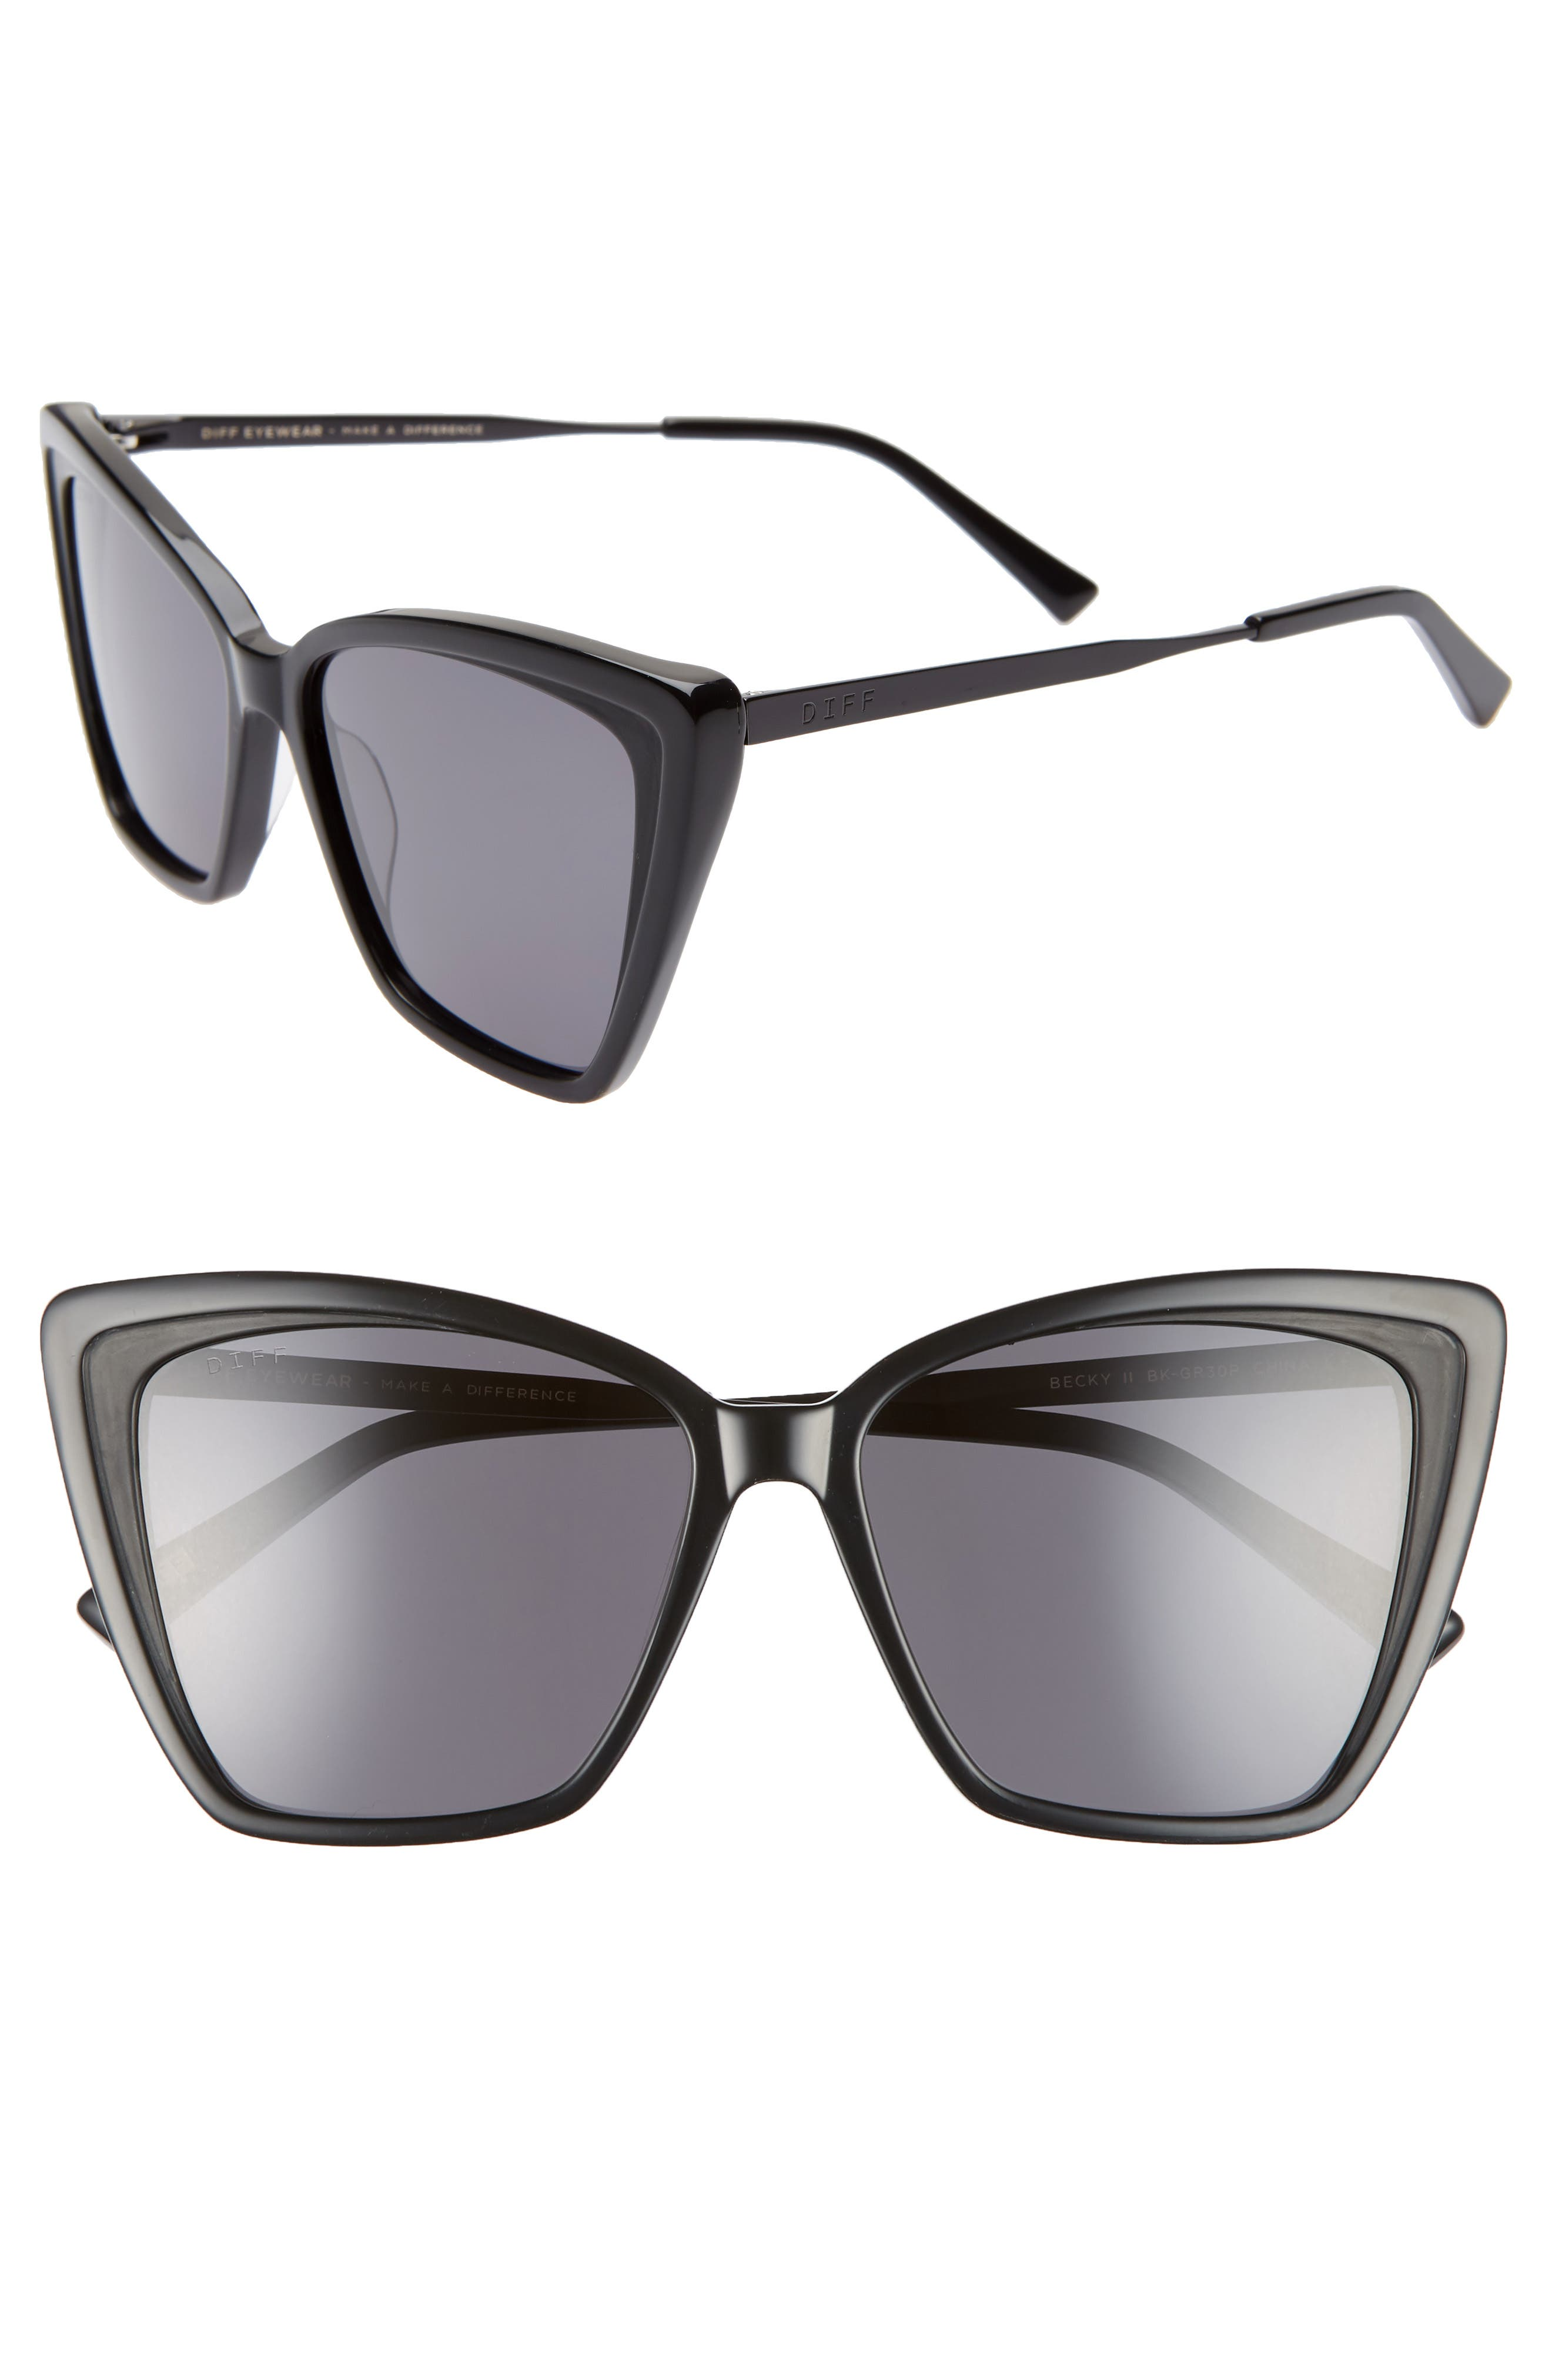 DIFF Becky II 55mm Cat Eye Sunglasses, Main, color, BLACK/ DARK SMOKE